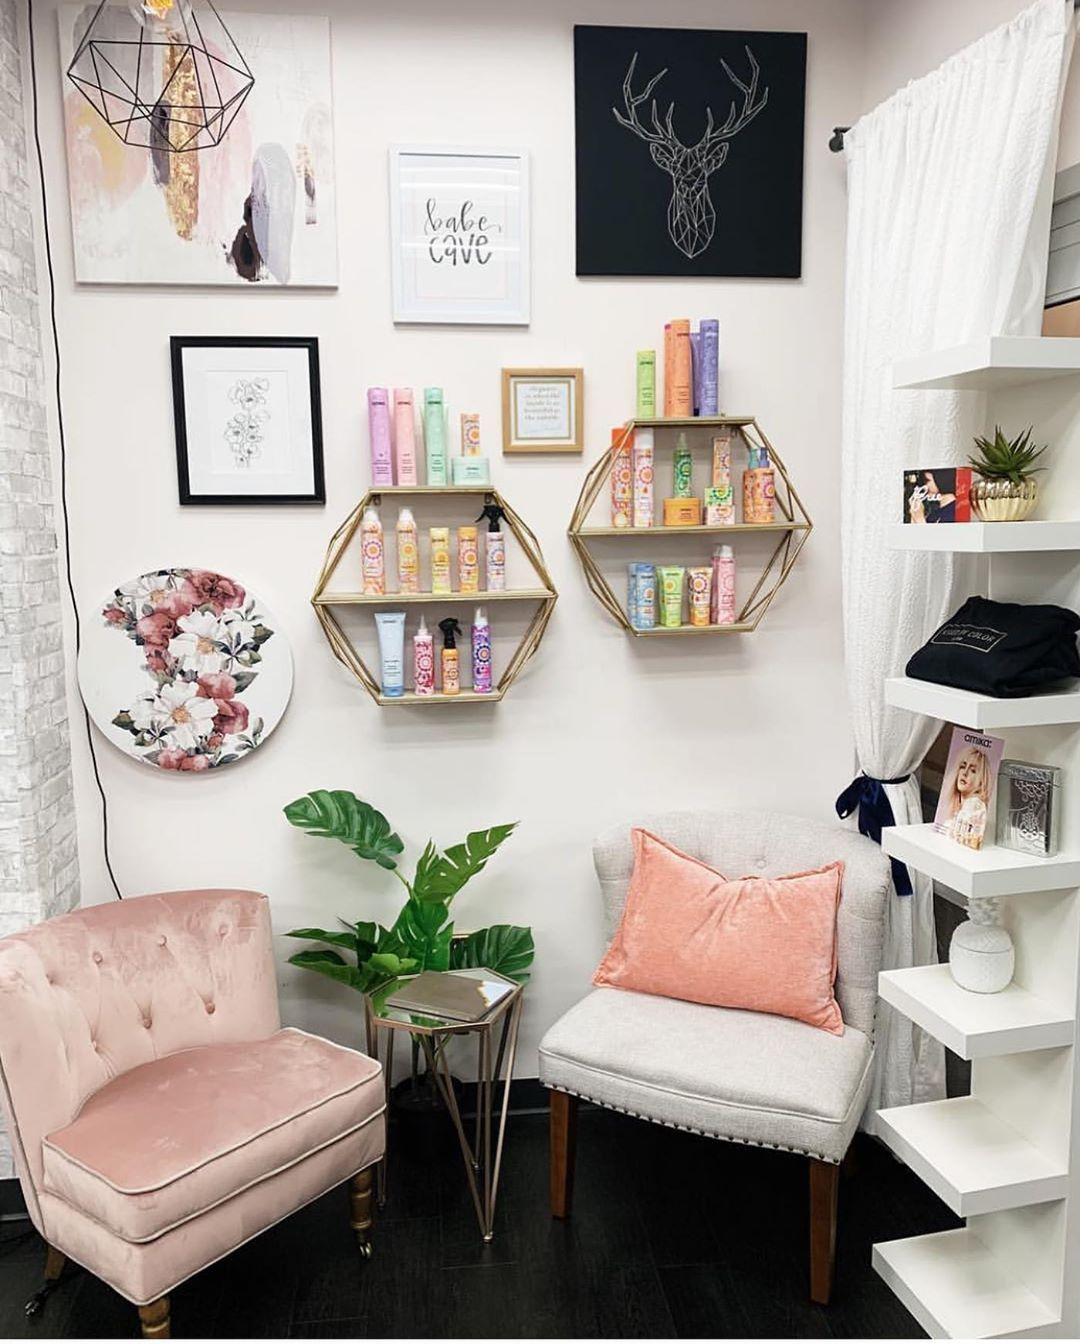 salon interior design south africa #mens hair salon interior